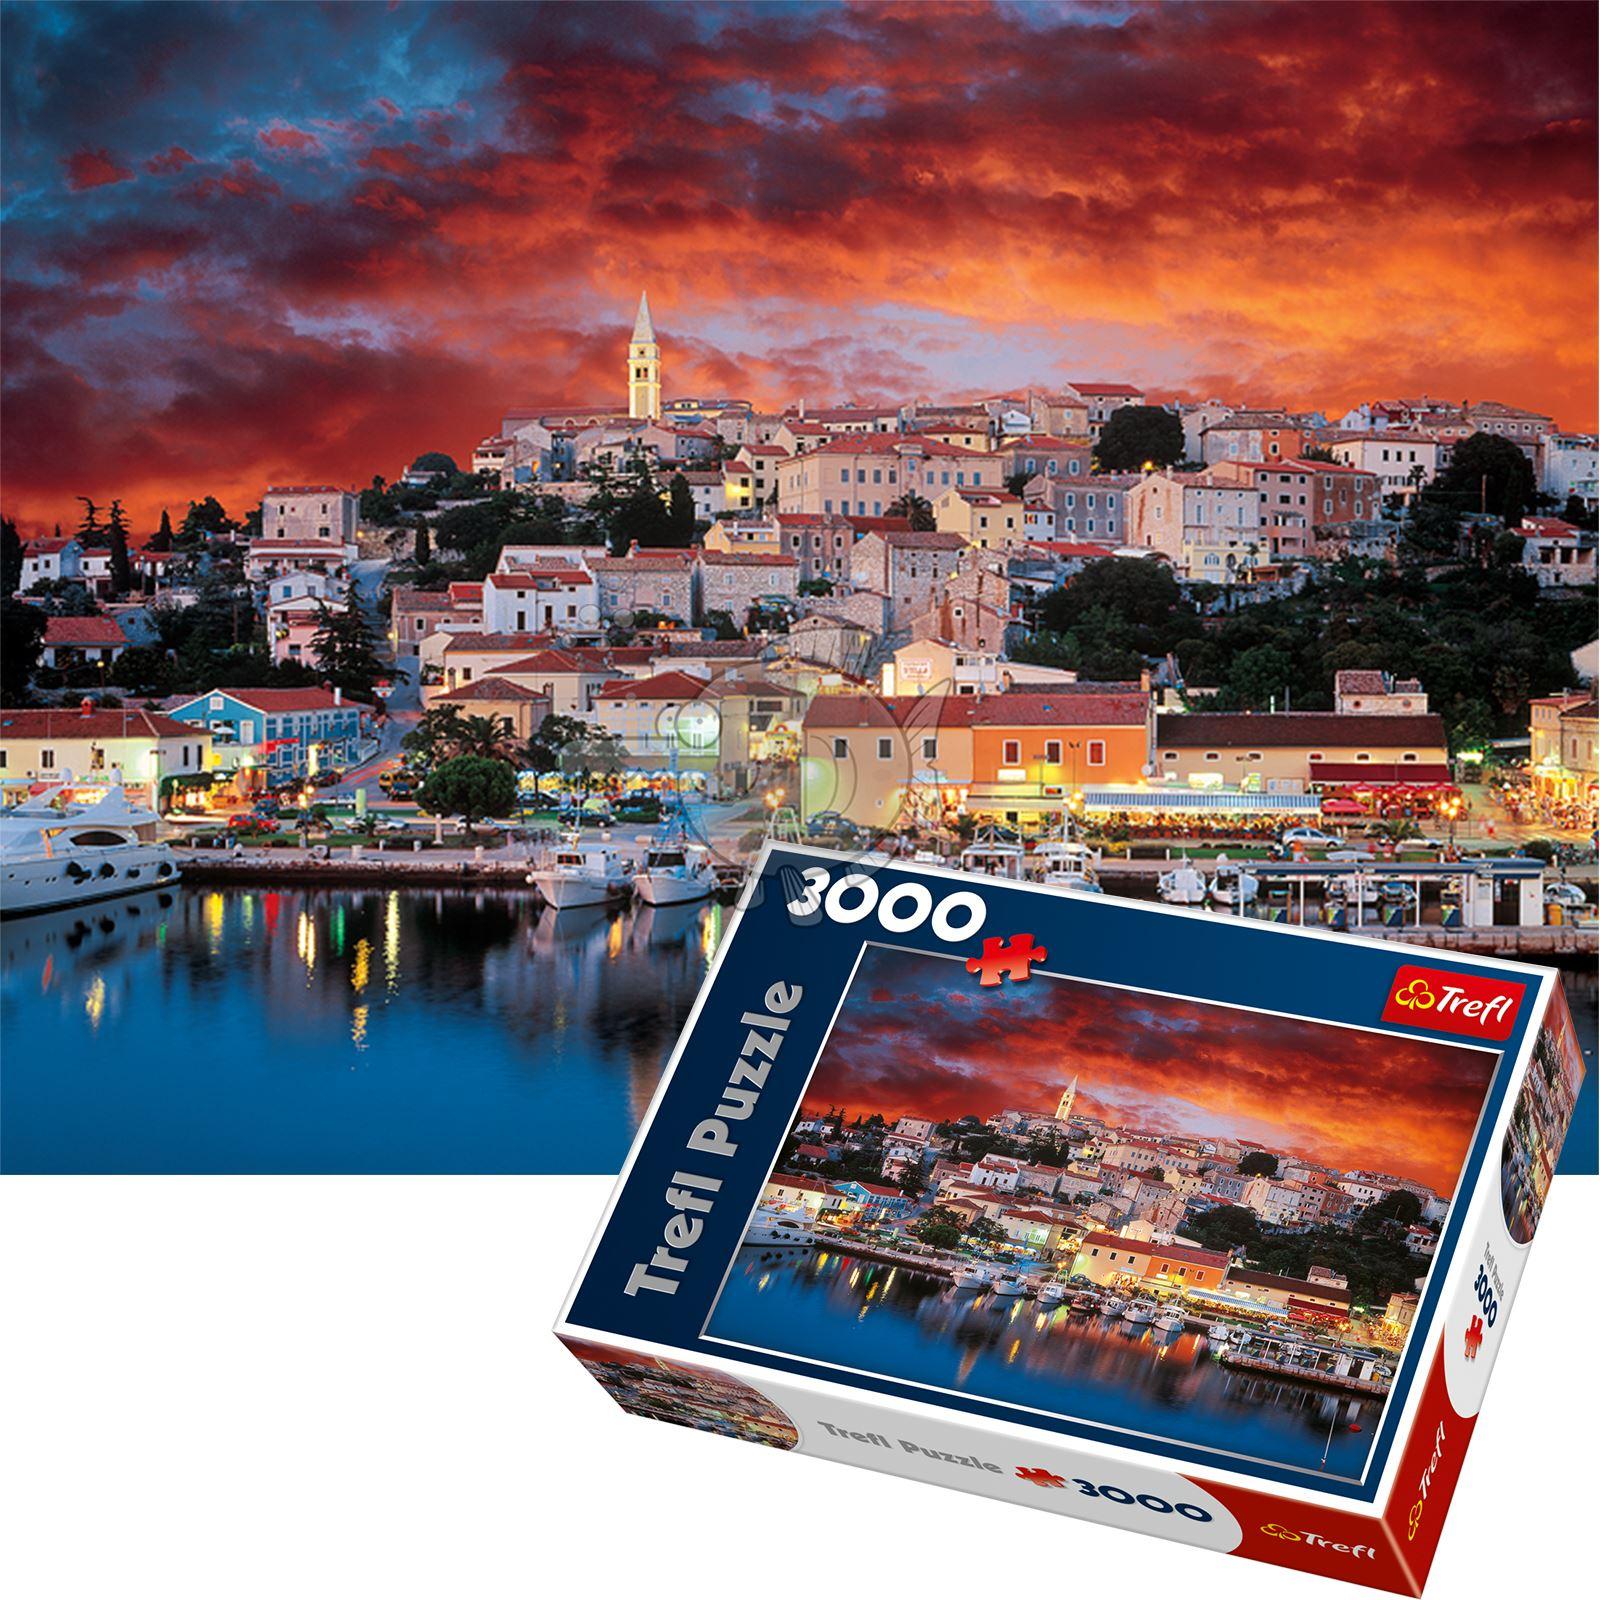 Trefl-300-500-1000-1500-2000-3000-4000-6000-Piece-Jigsaw-Puzzle-Landscapes-City thumbnail 450